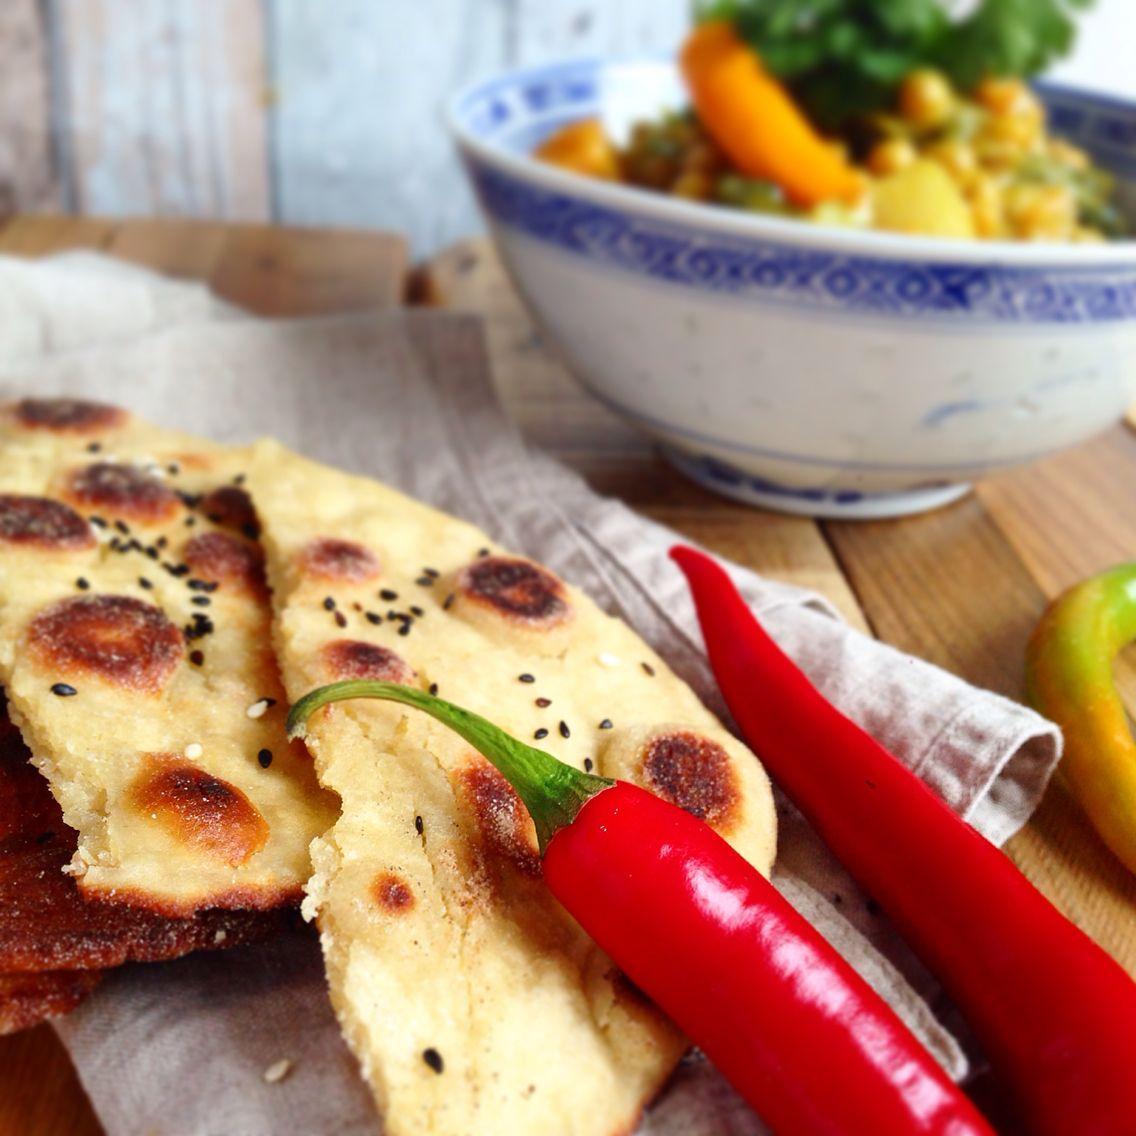 Lecker Kichererbsen Curry mit Mangold und selbst gemachten naanbrot Rezept unter www.soschmecktliebe.com